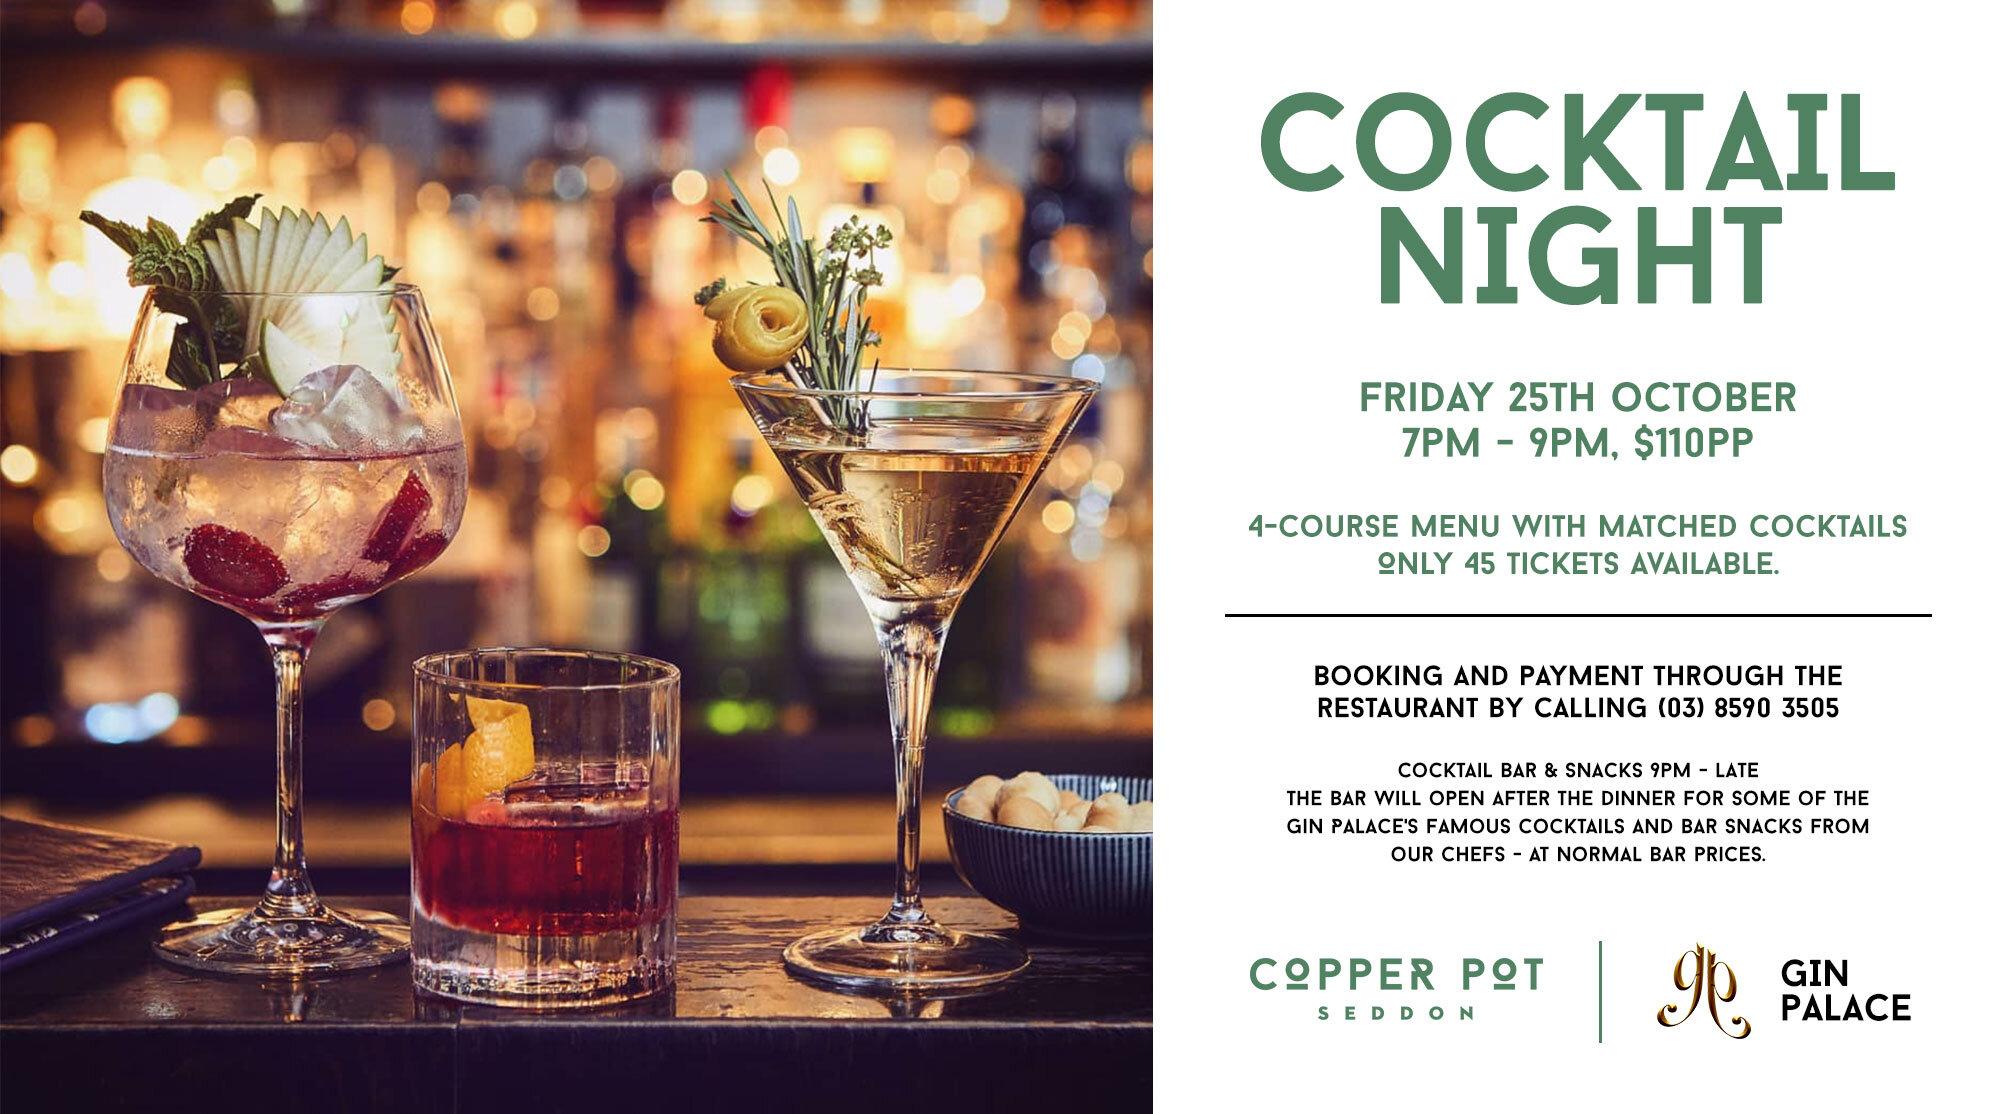 20191010 Copper Pot Website Banner - Cocktail Night.jpg